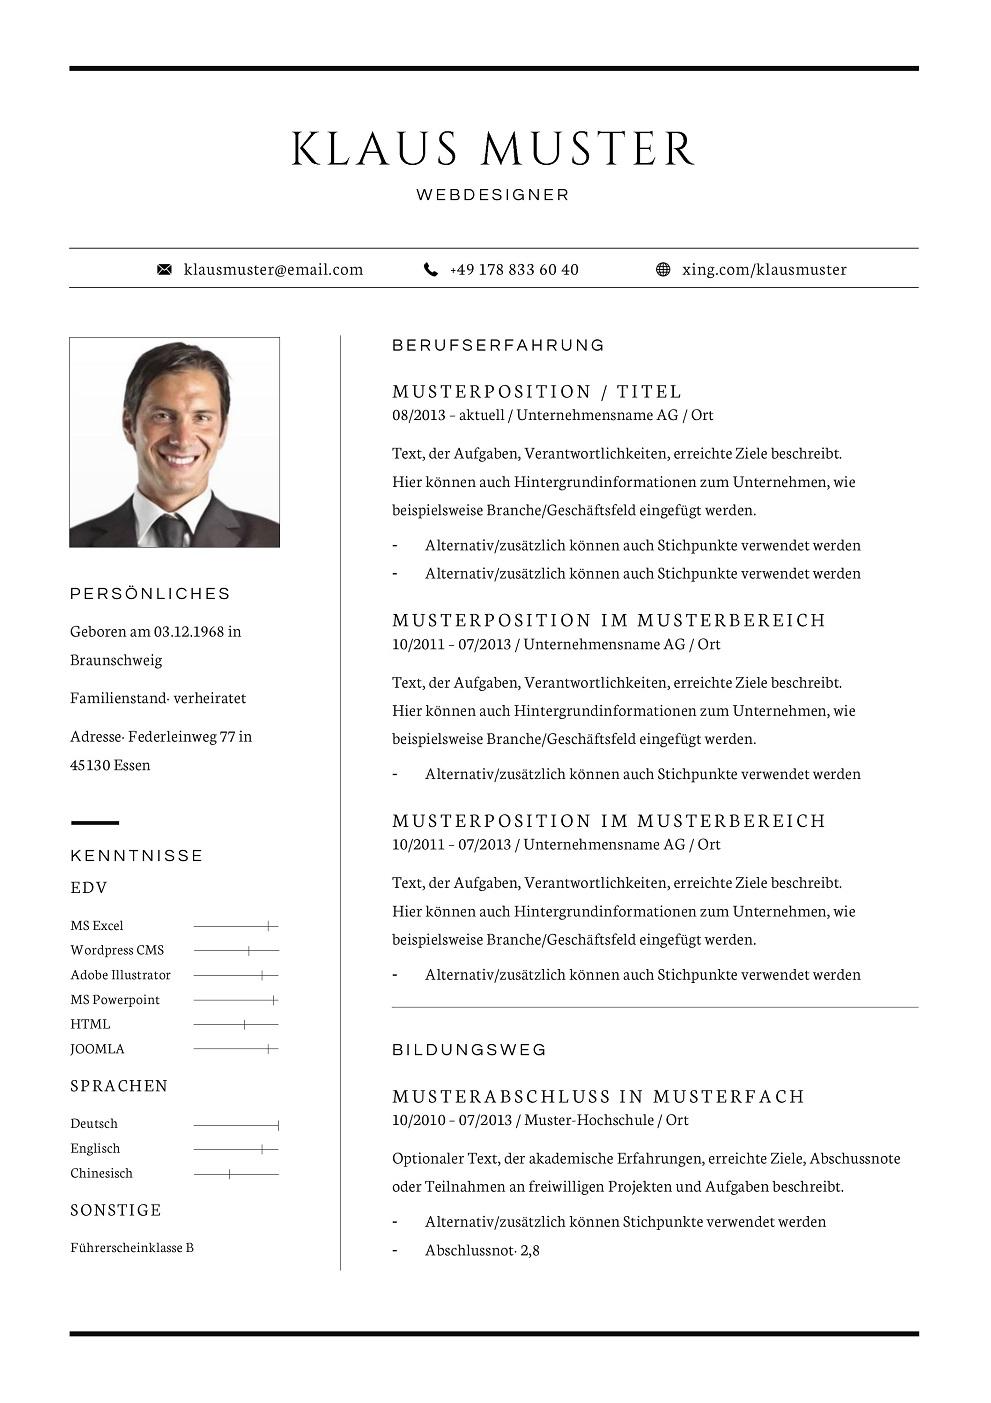 Premium Bewerbungsmuster 12 | lebenslaufdesigns.de